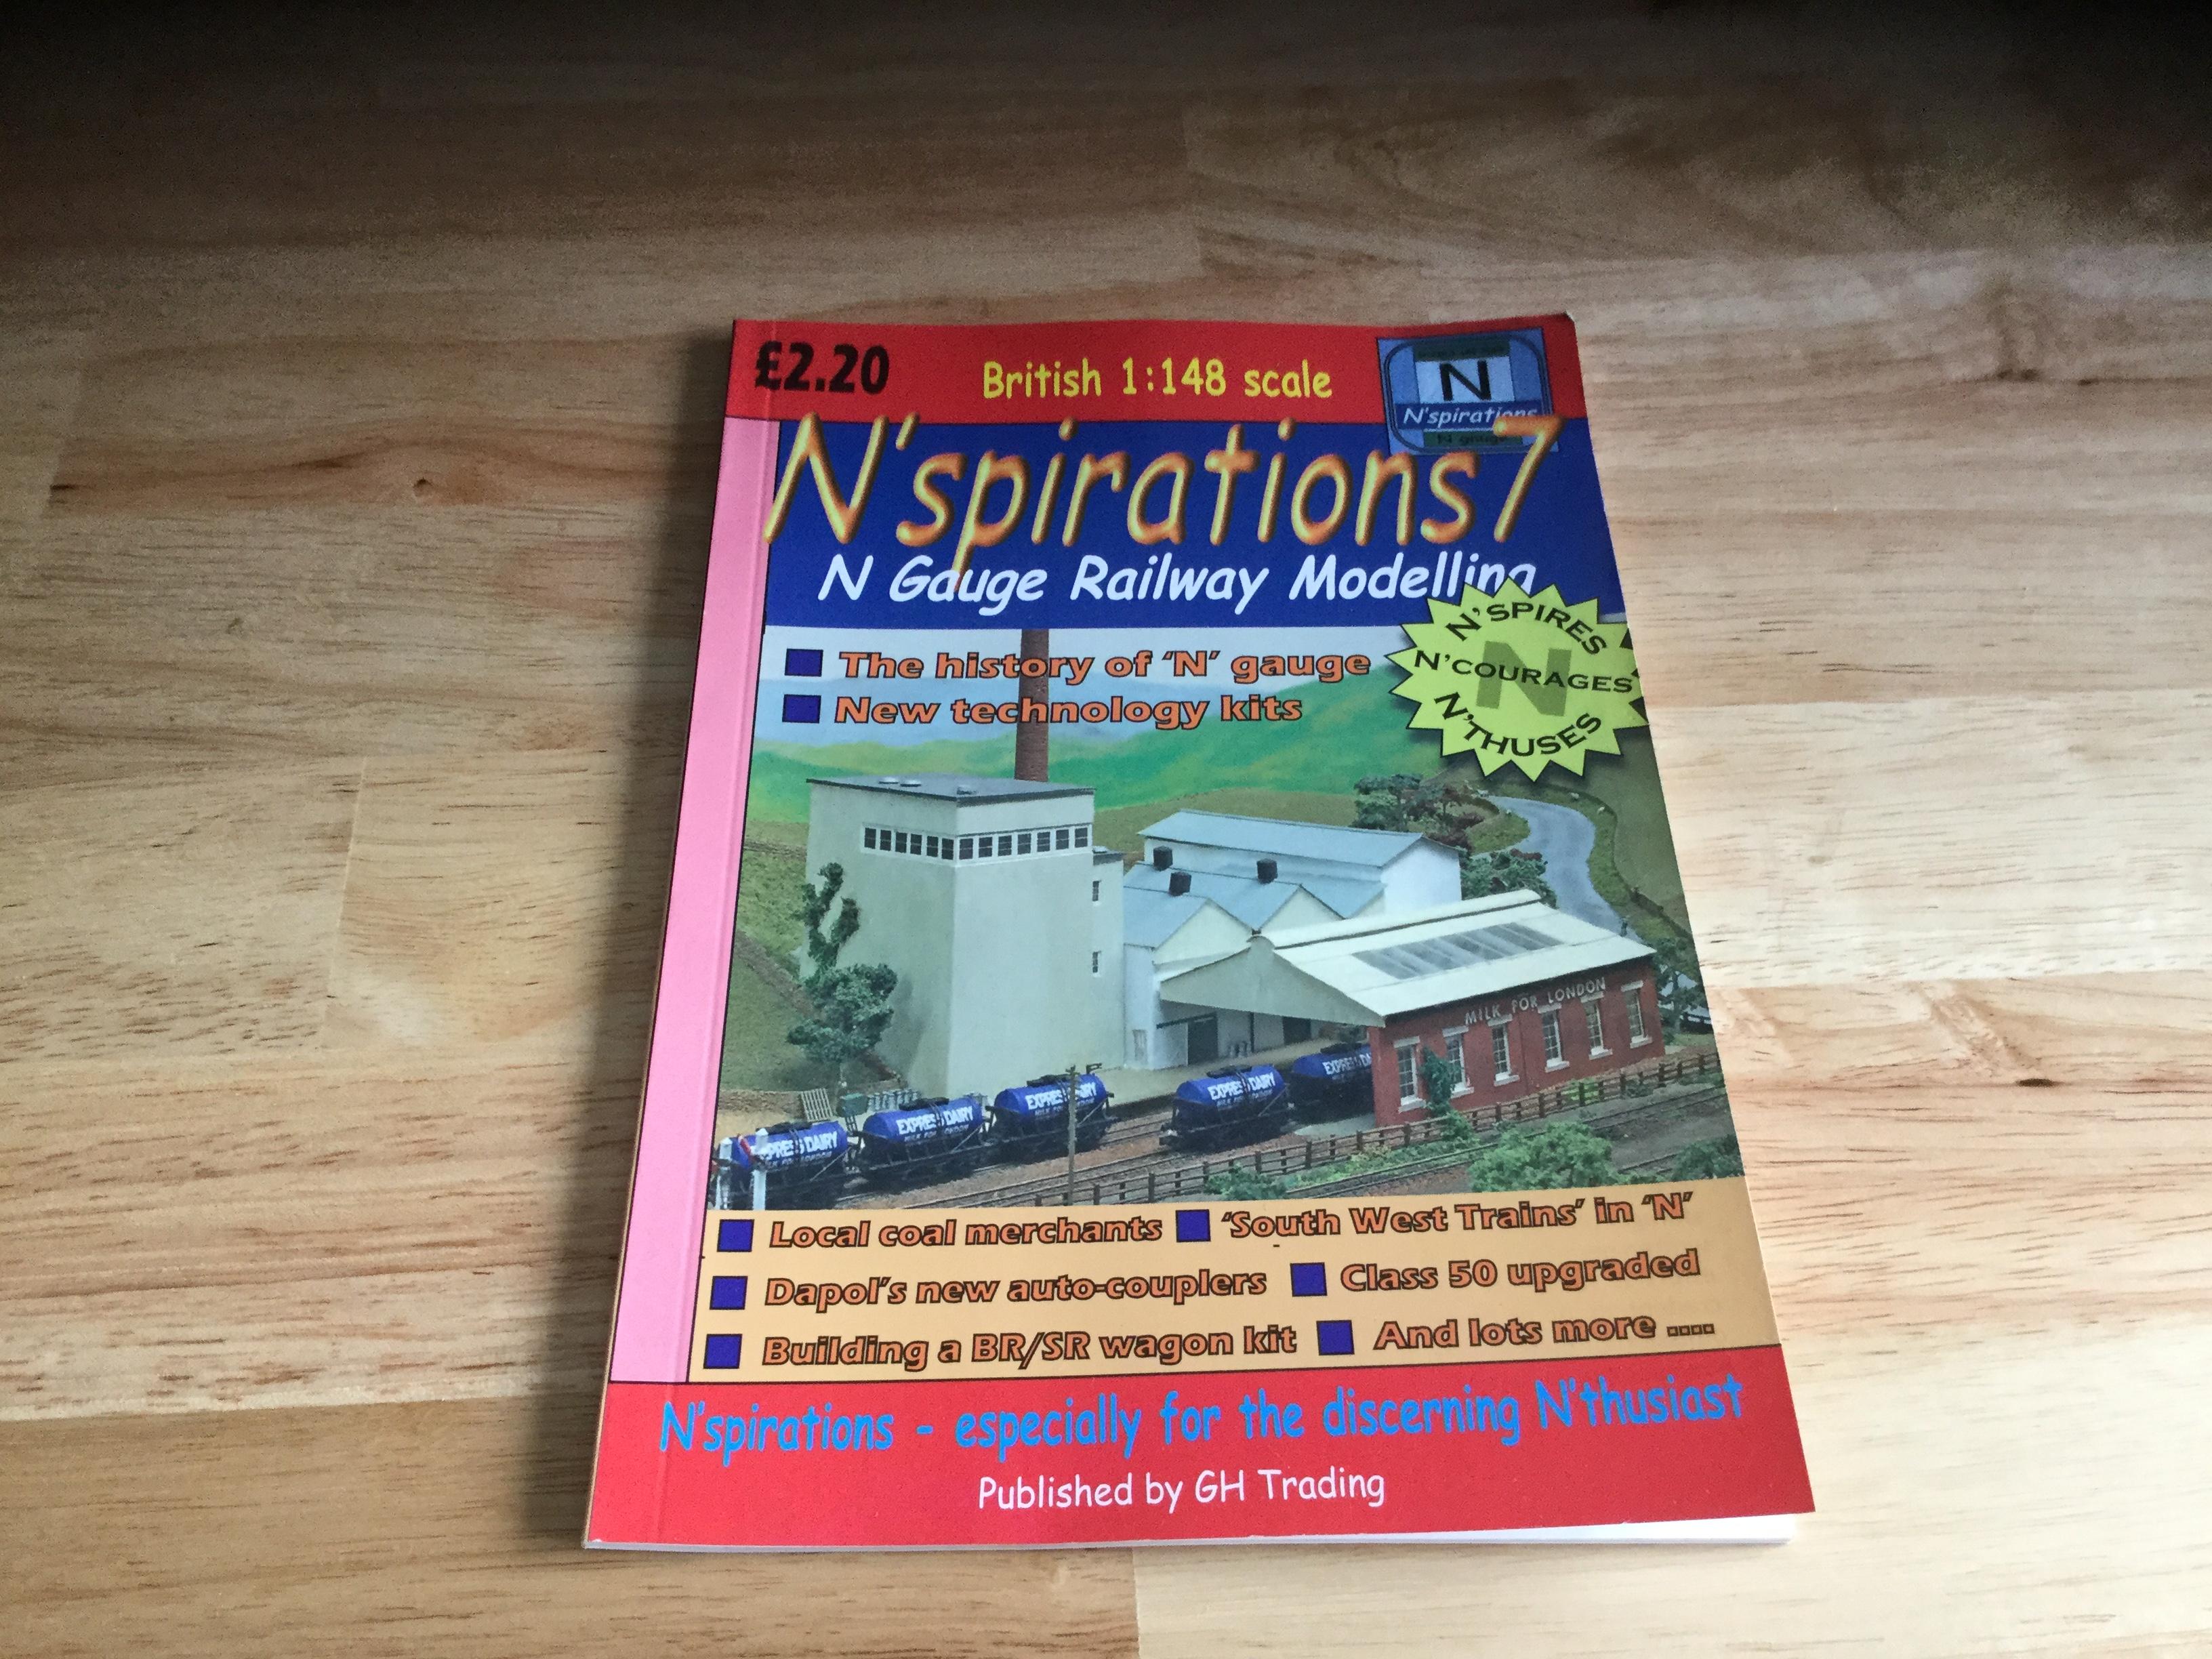 N'spirations7 Magazine